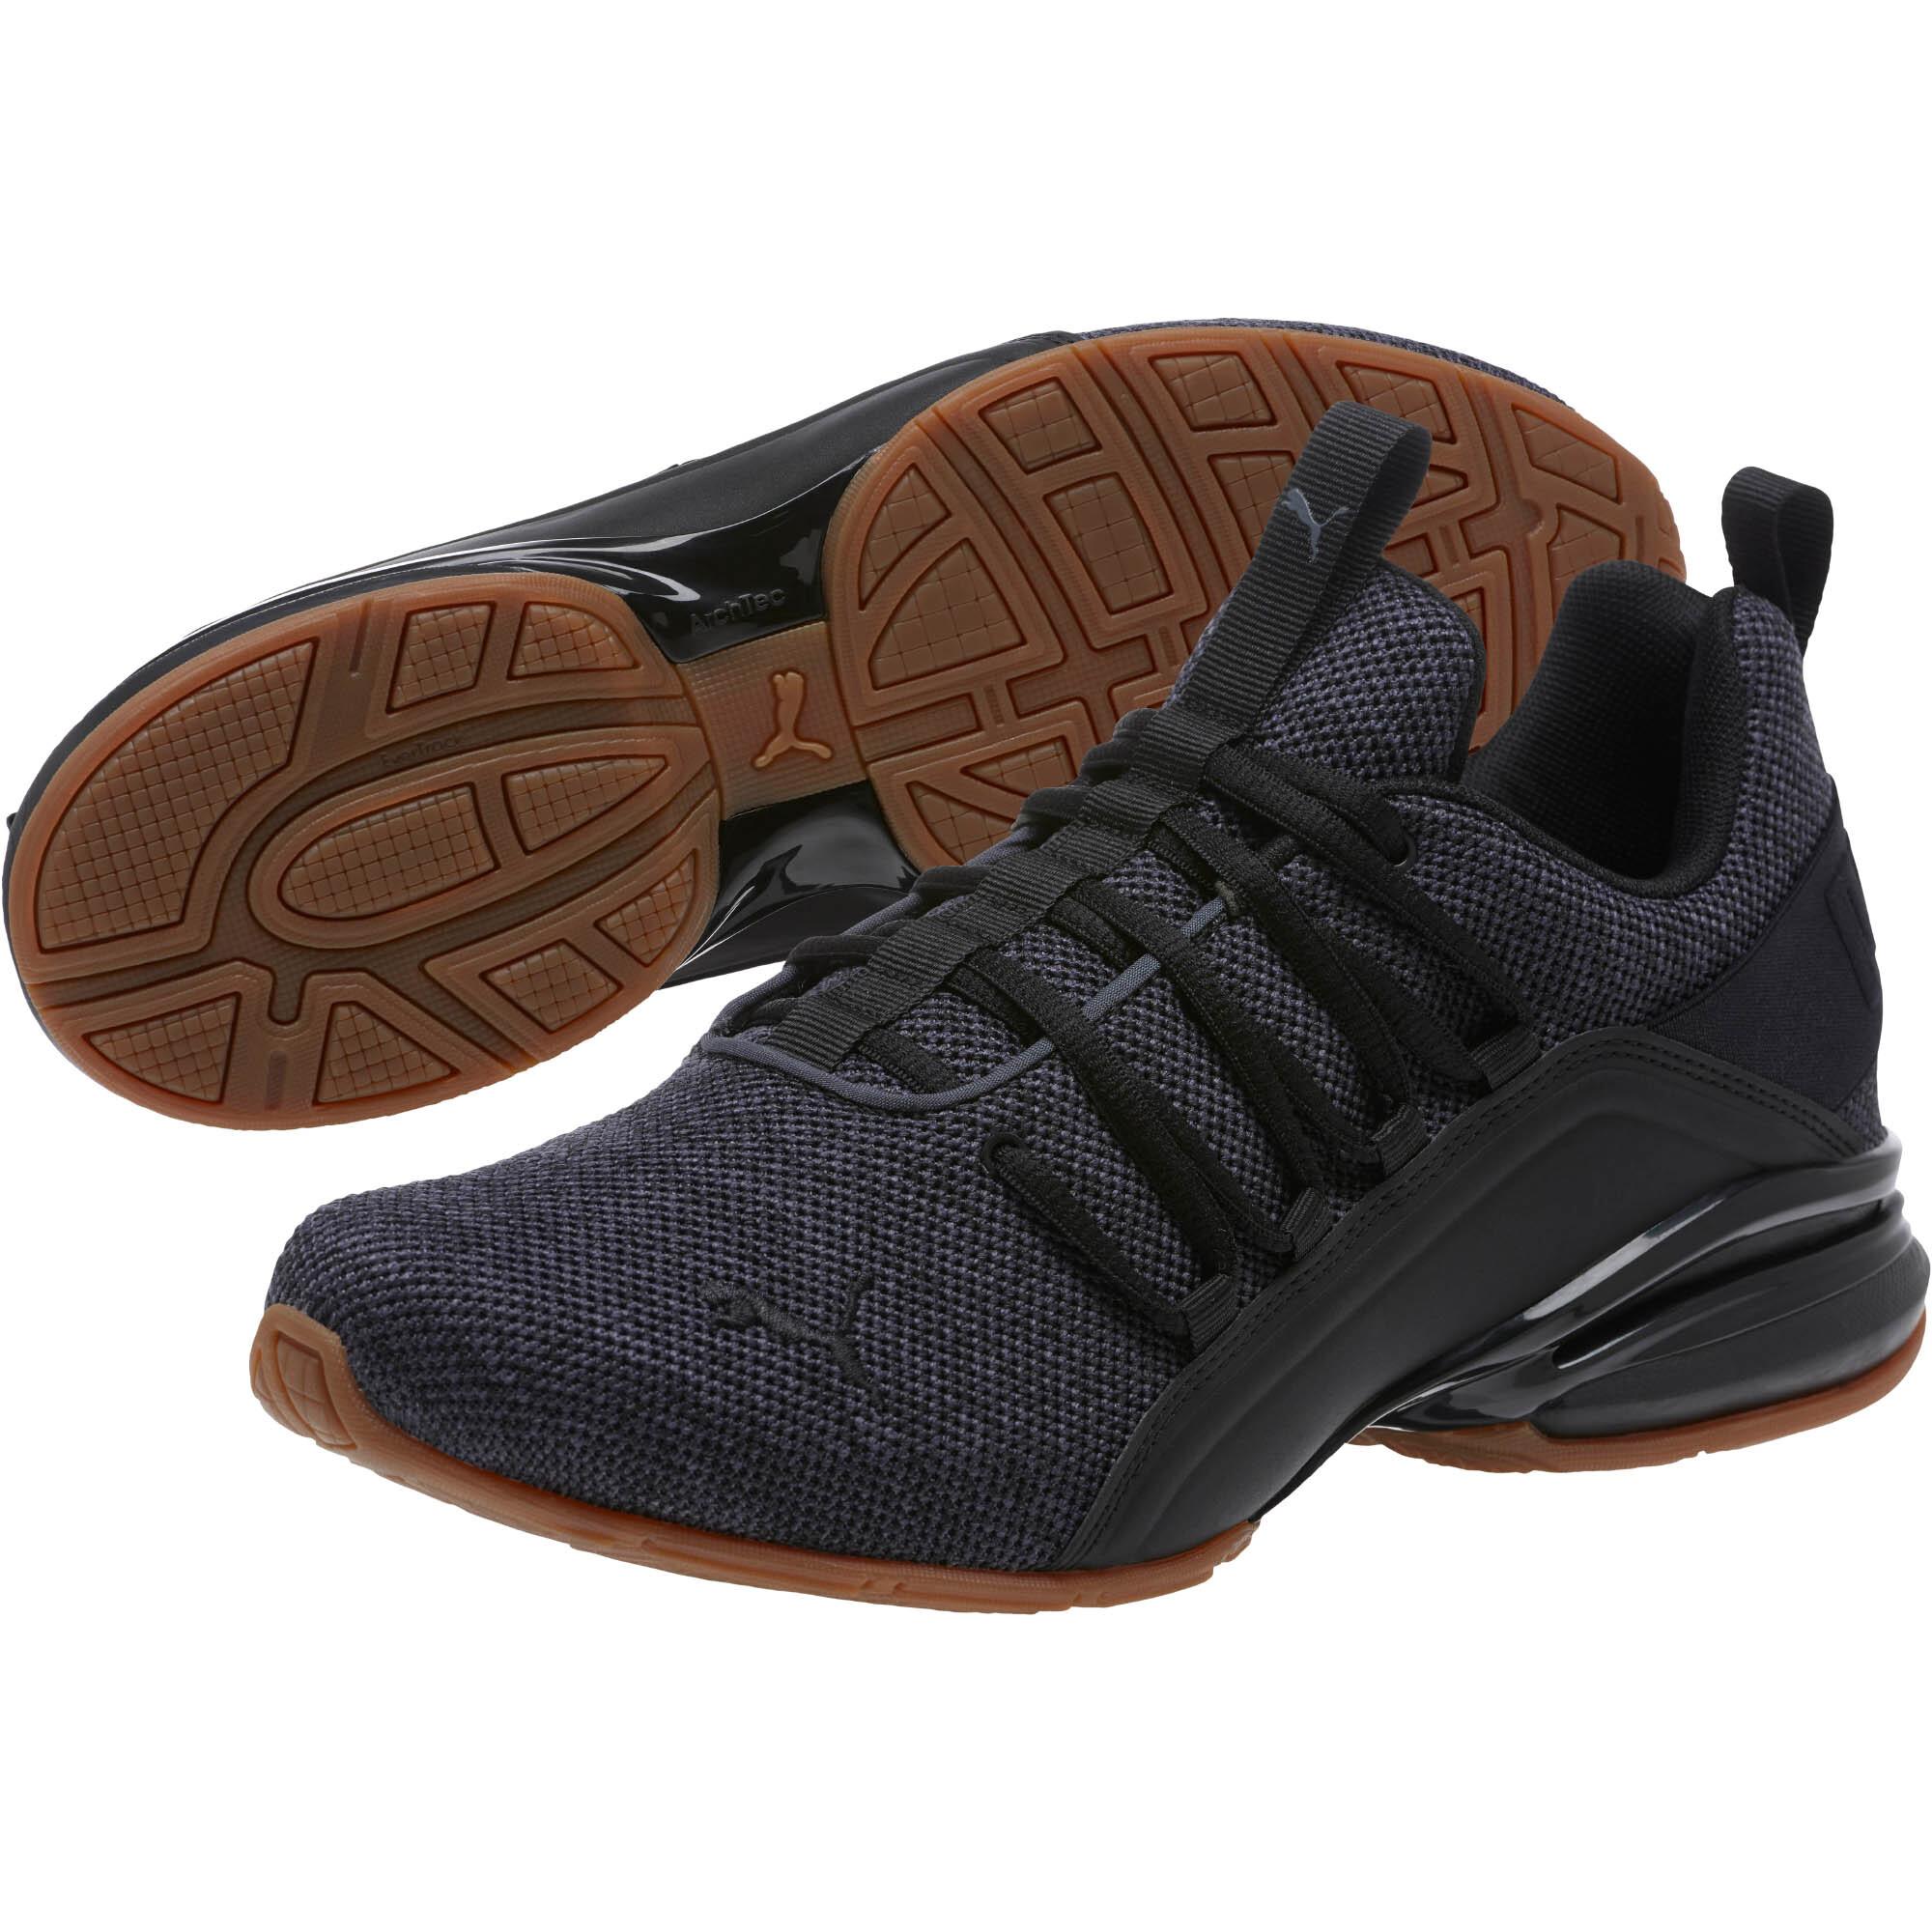 PUMA-Axelion-Men-039-s-Training-Shoes-Men-Shoe-Running thumbnail 23